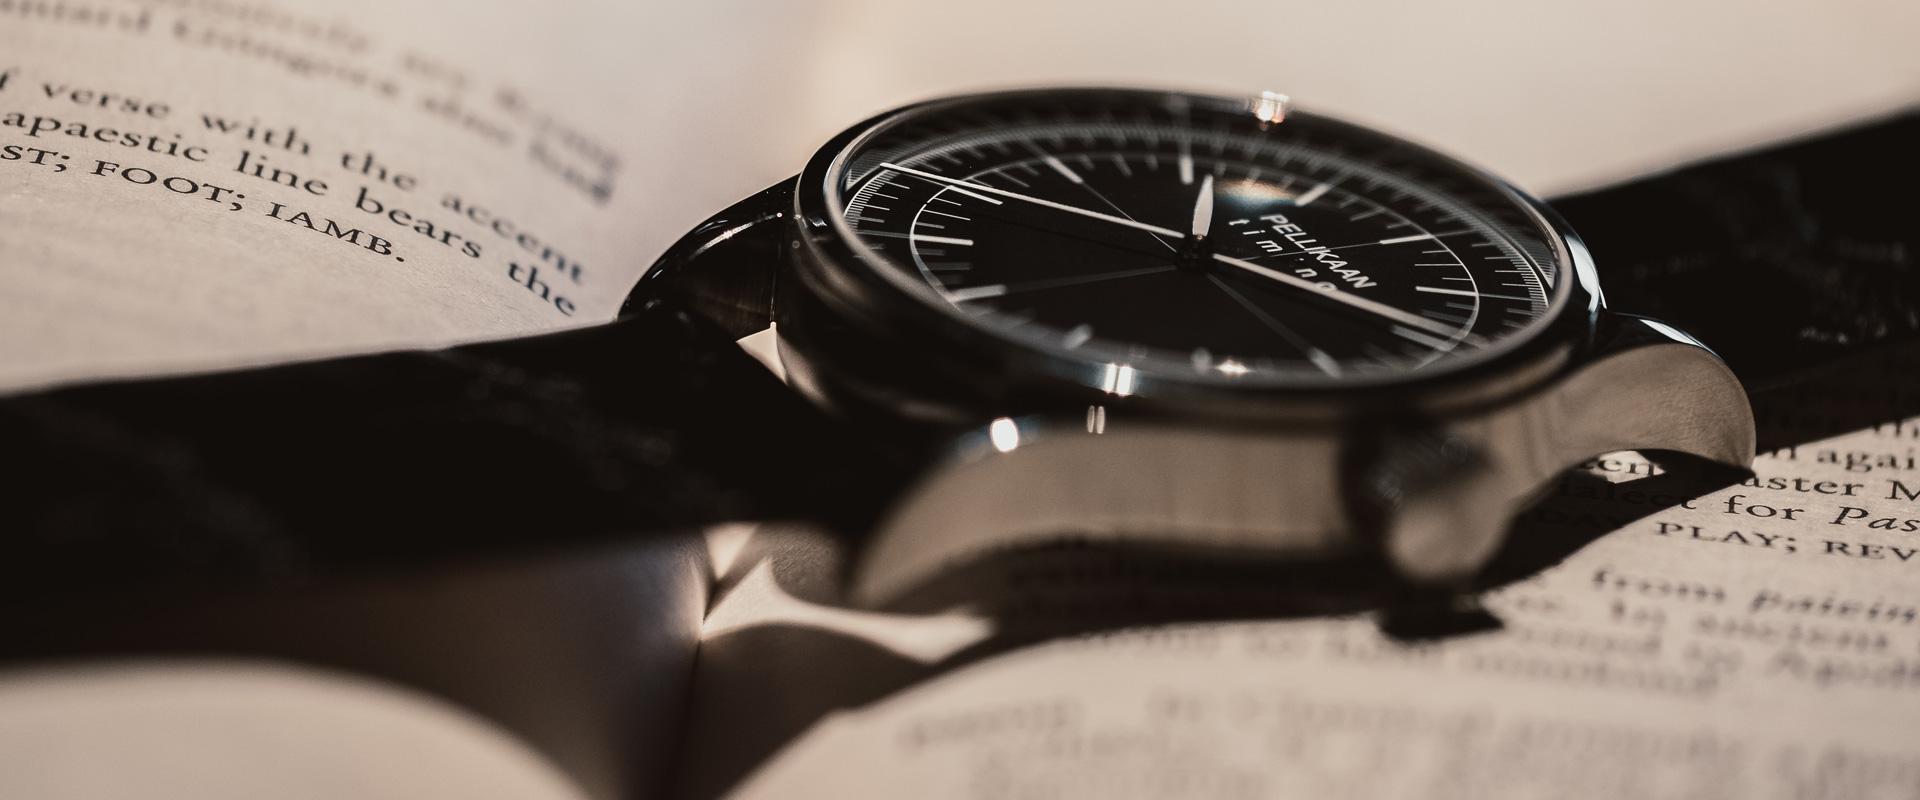 Over Pellikaan Timing Horloges